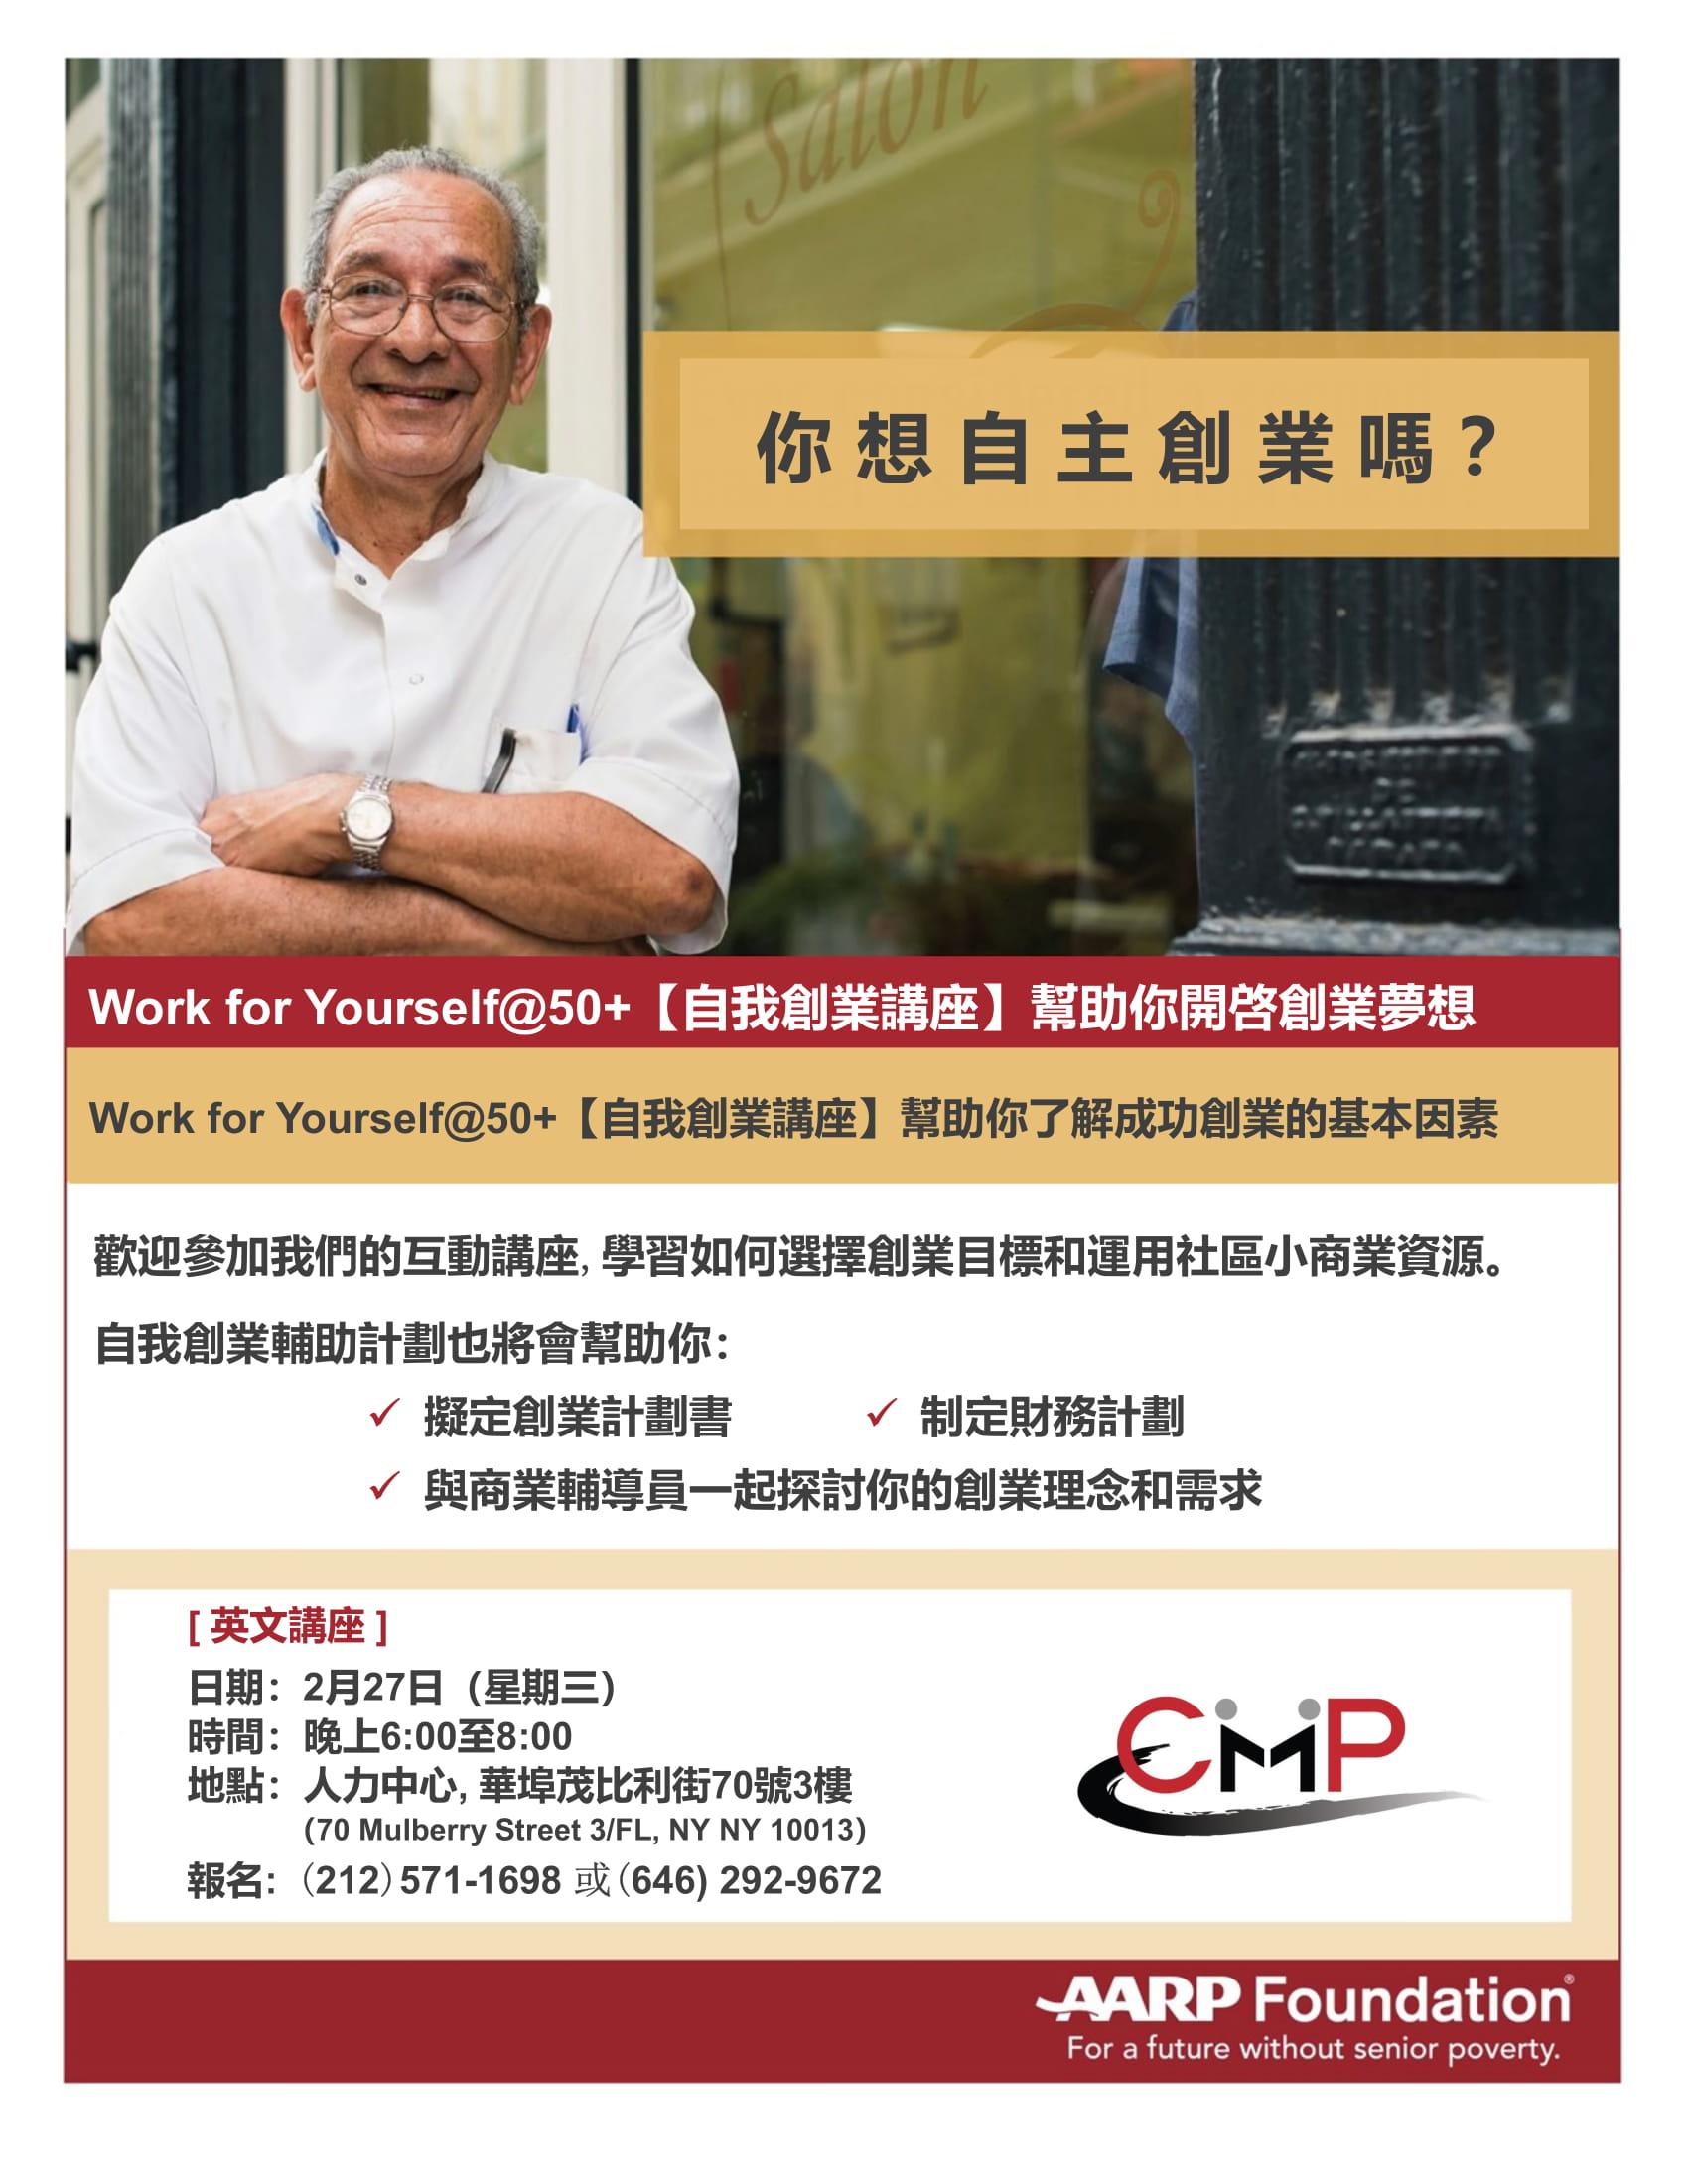 WFY50+ Workshop Flyer -Chinese.jpg